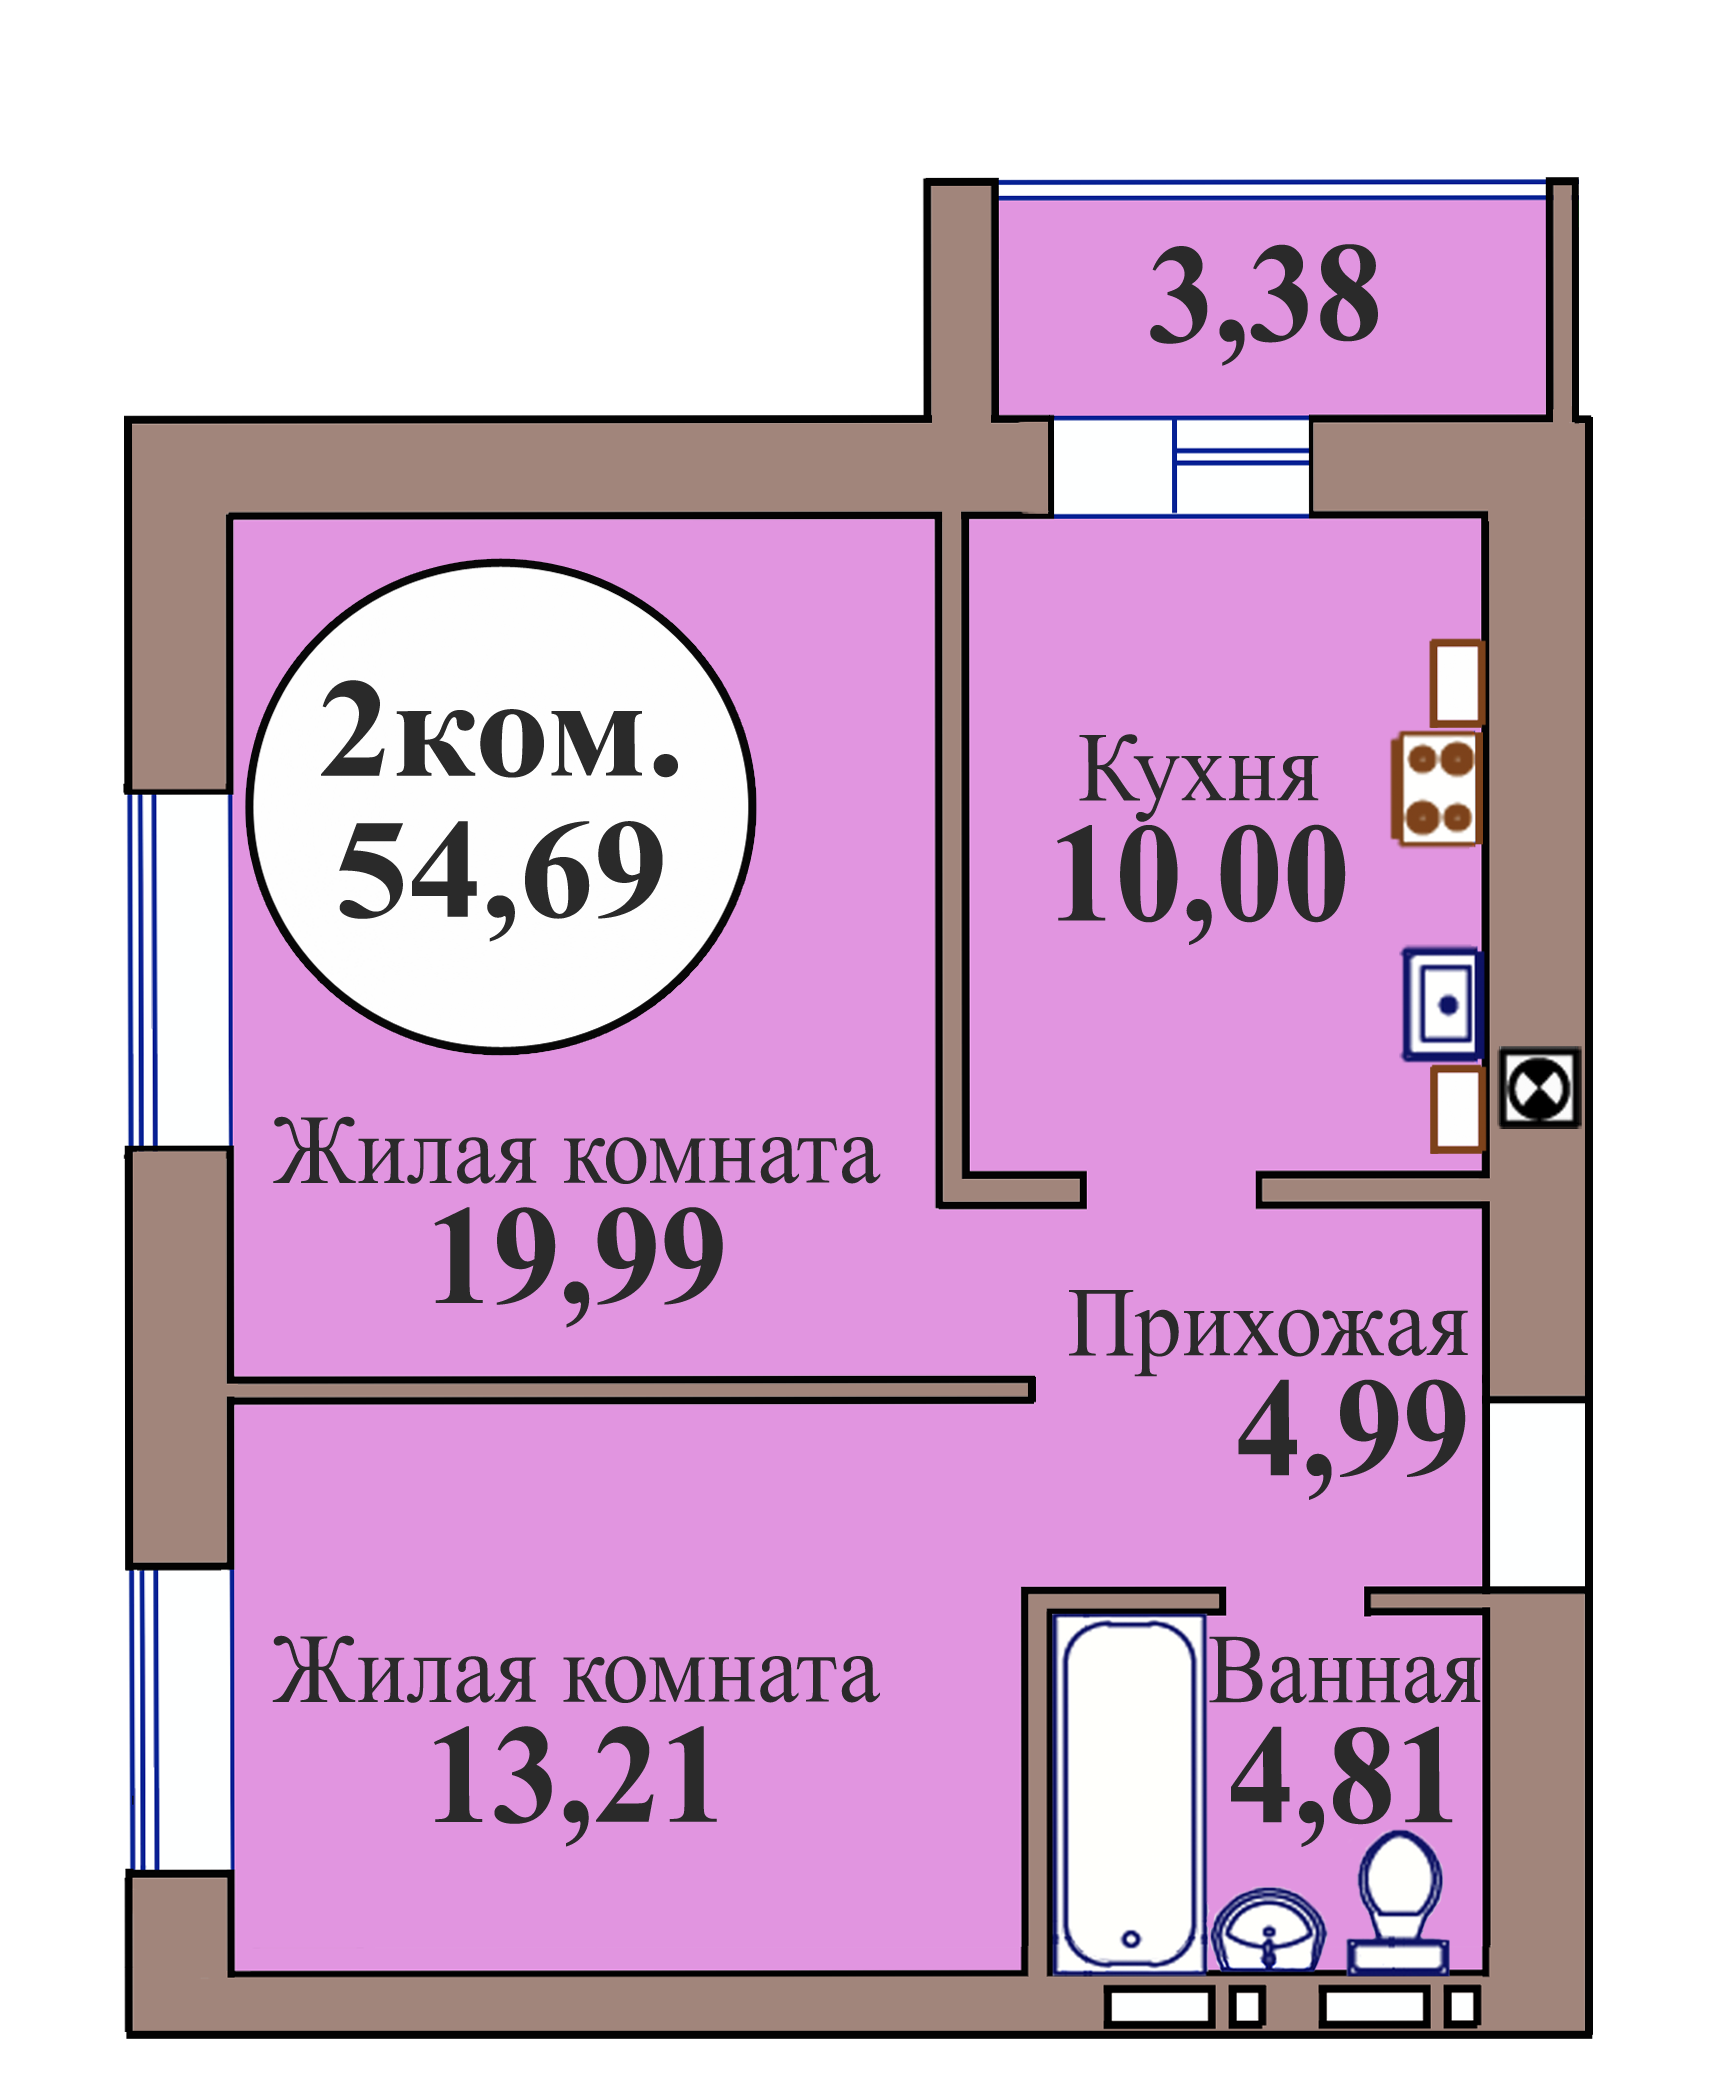 2-комн. кв. по пер. Калининградский, 5 кв. 239 в Калининграде